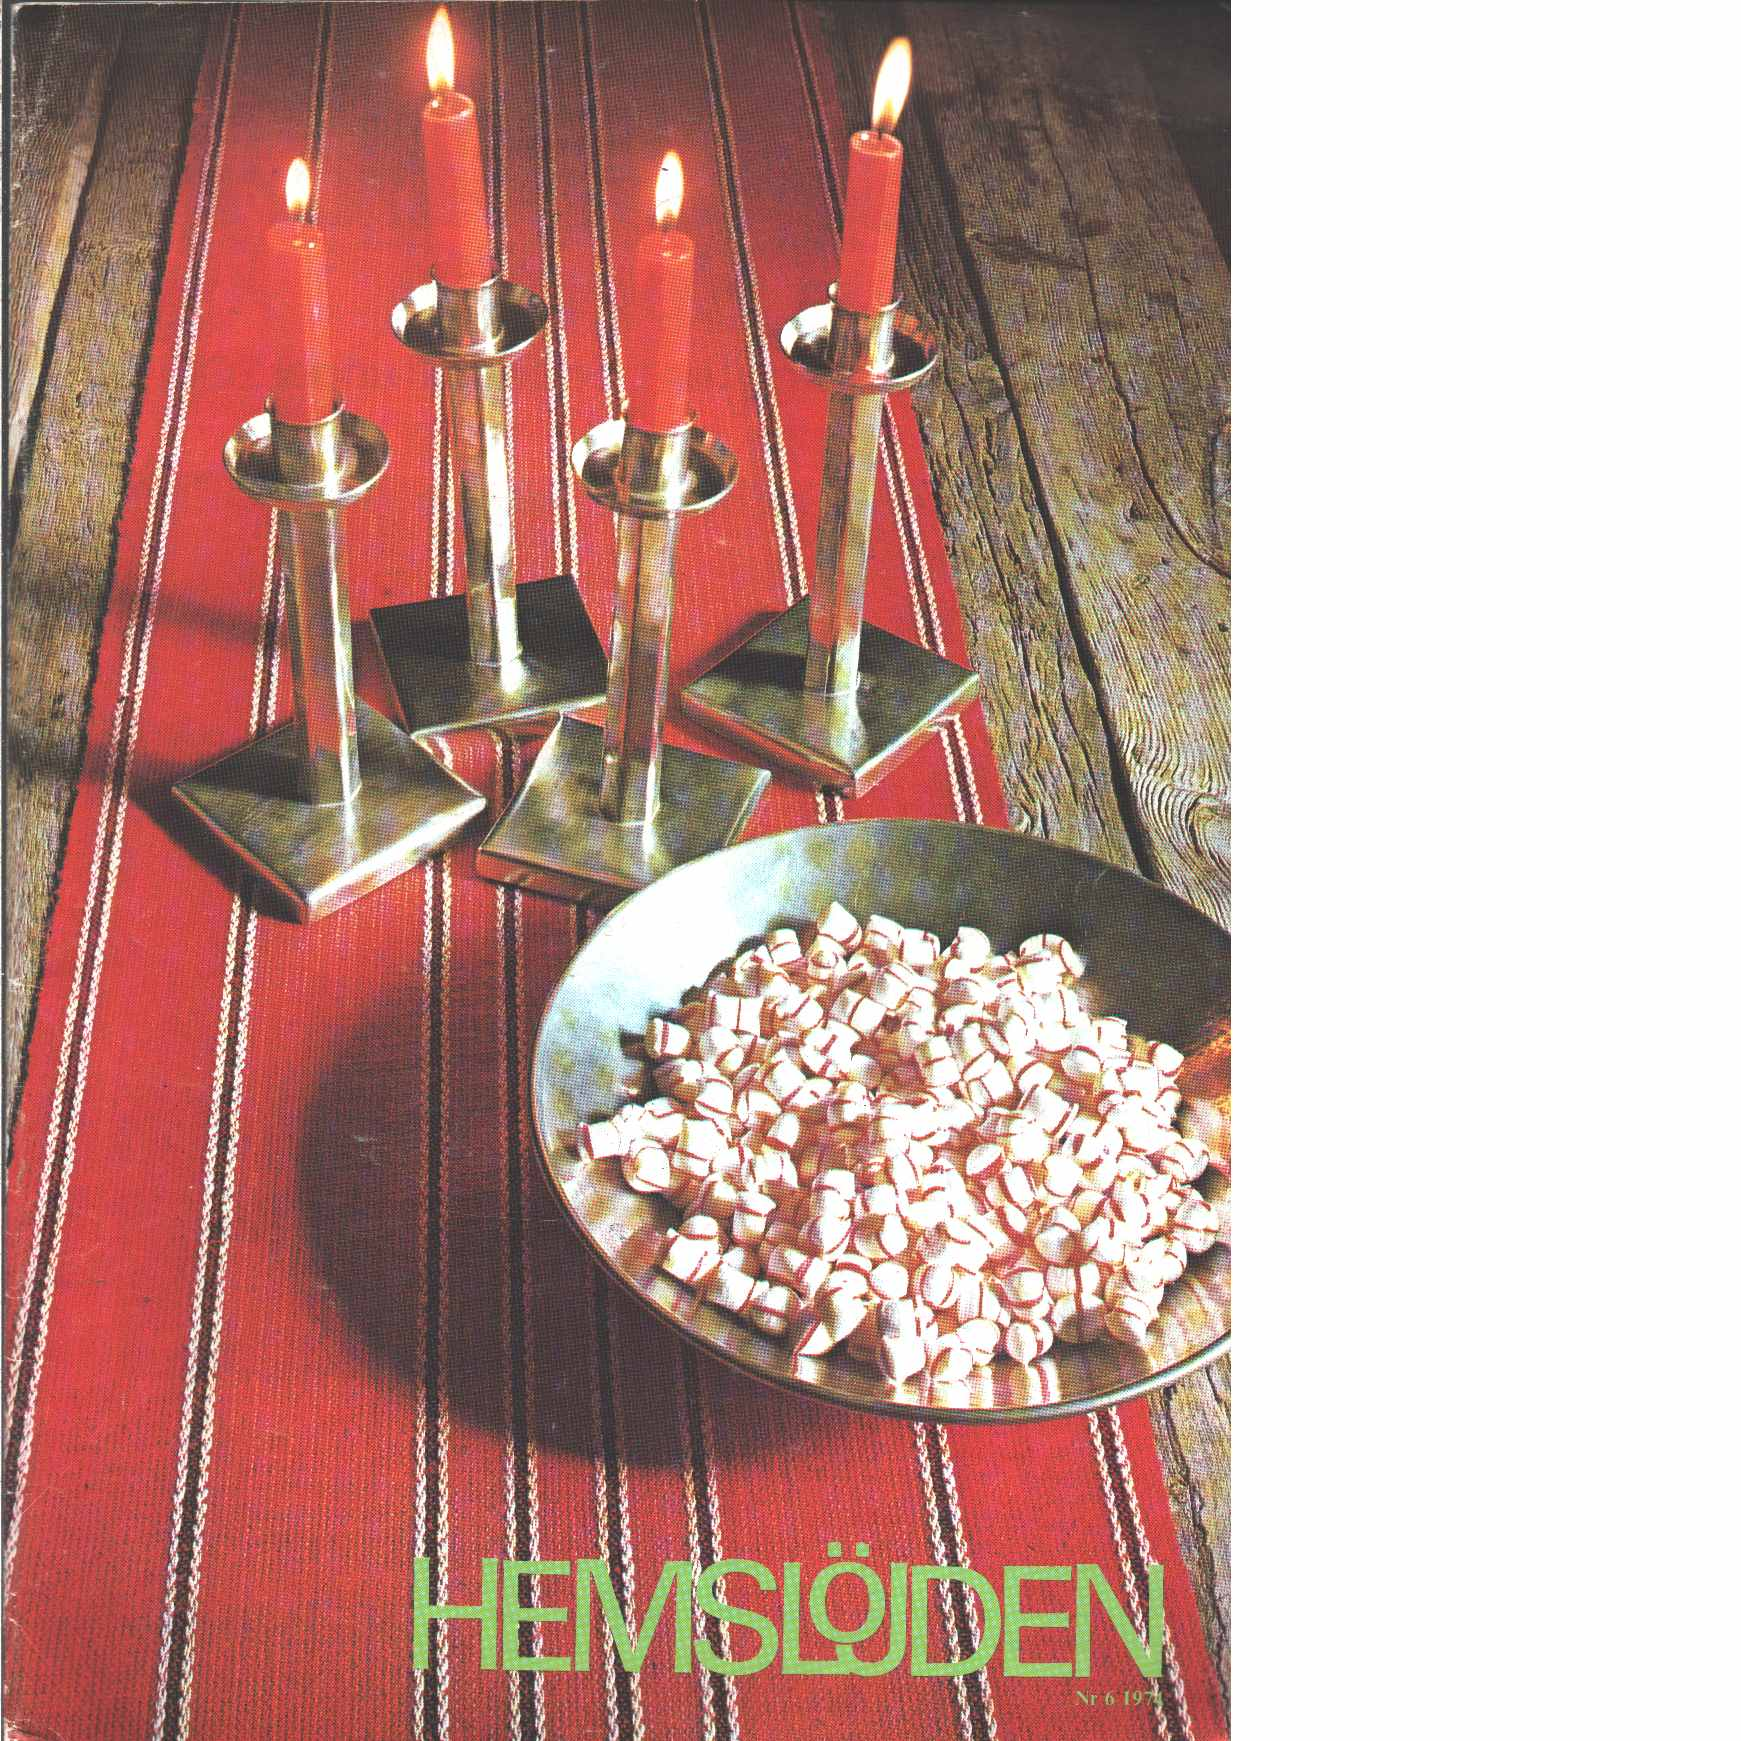 Hemslöjden 5-1974 - Red.